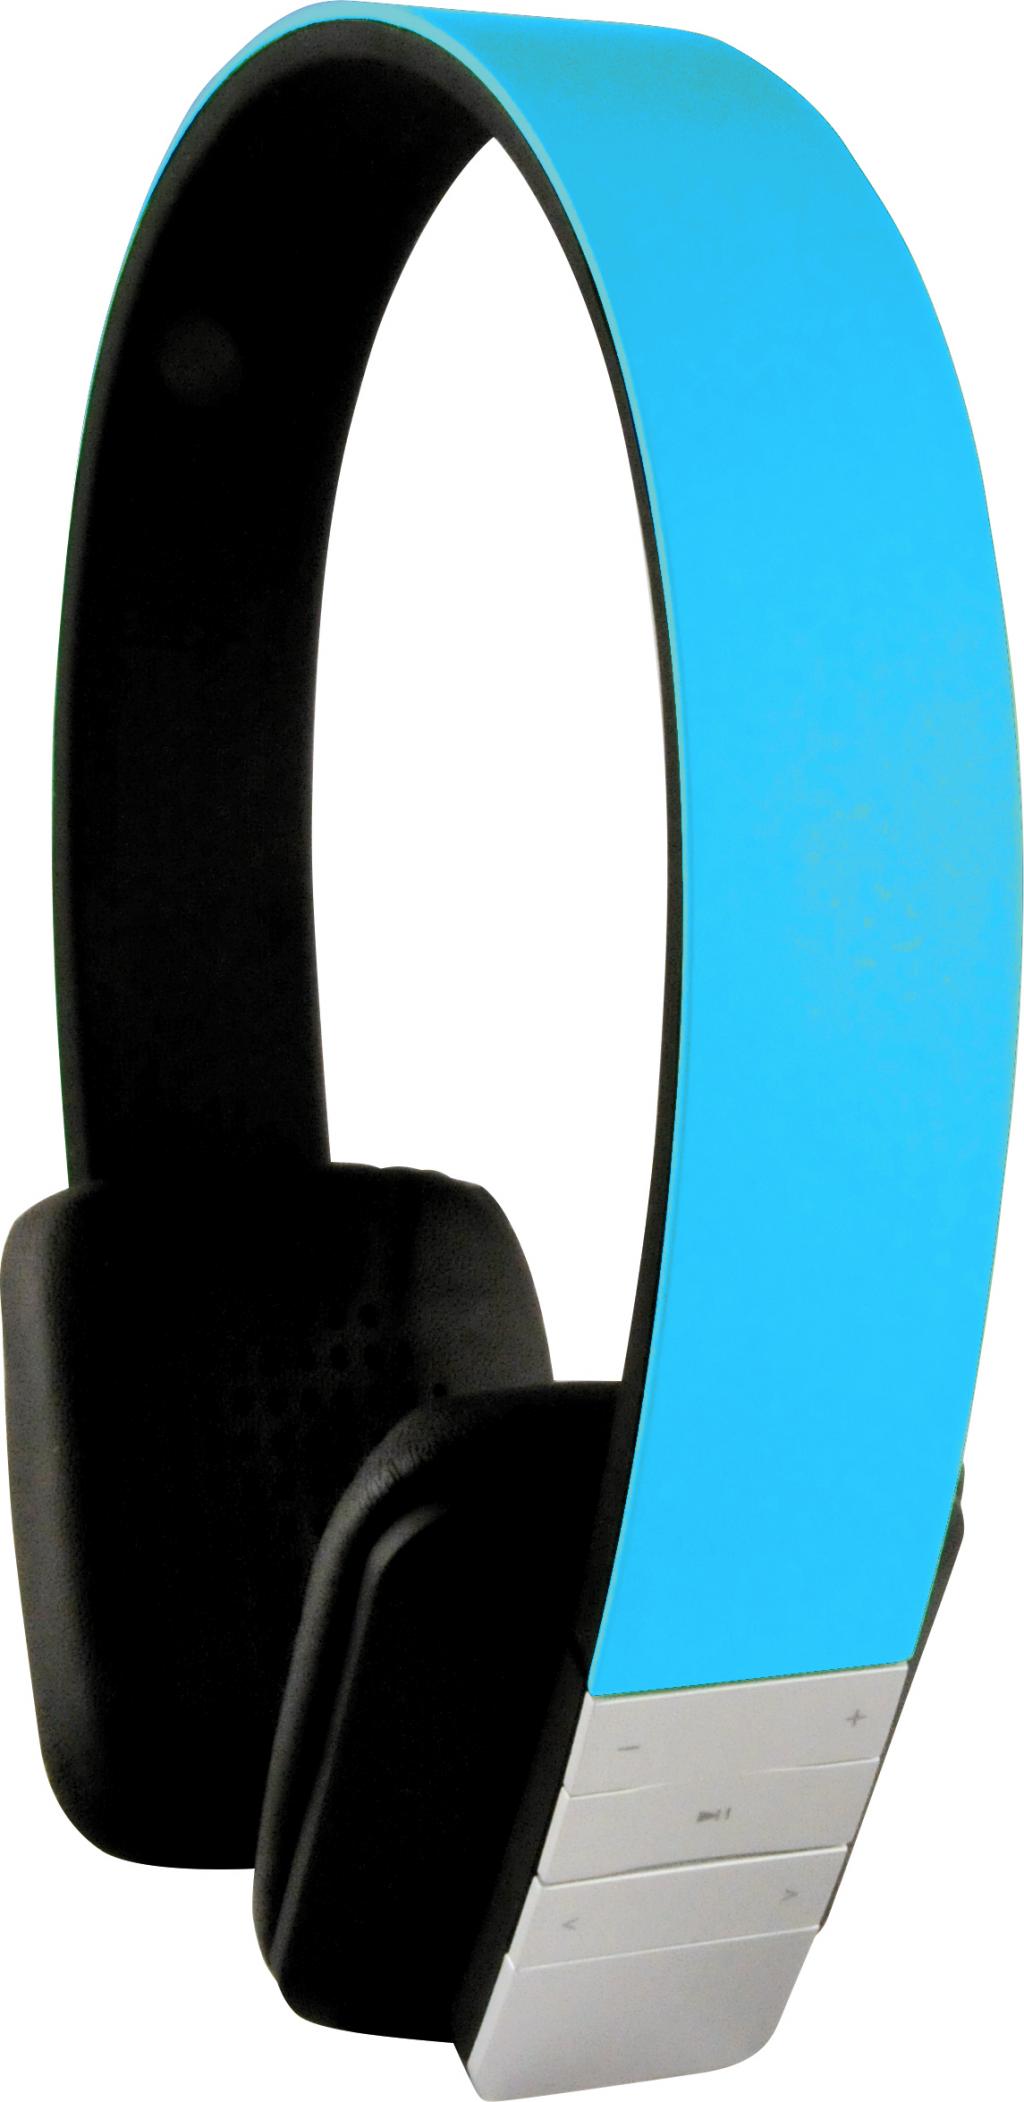 Schwaiger KH200 BTB Bluetooth hörlur GRYMT LJUD BLÅ